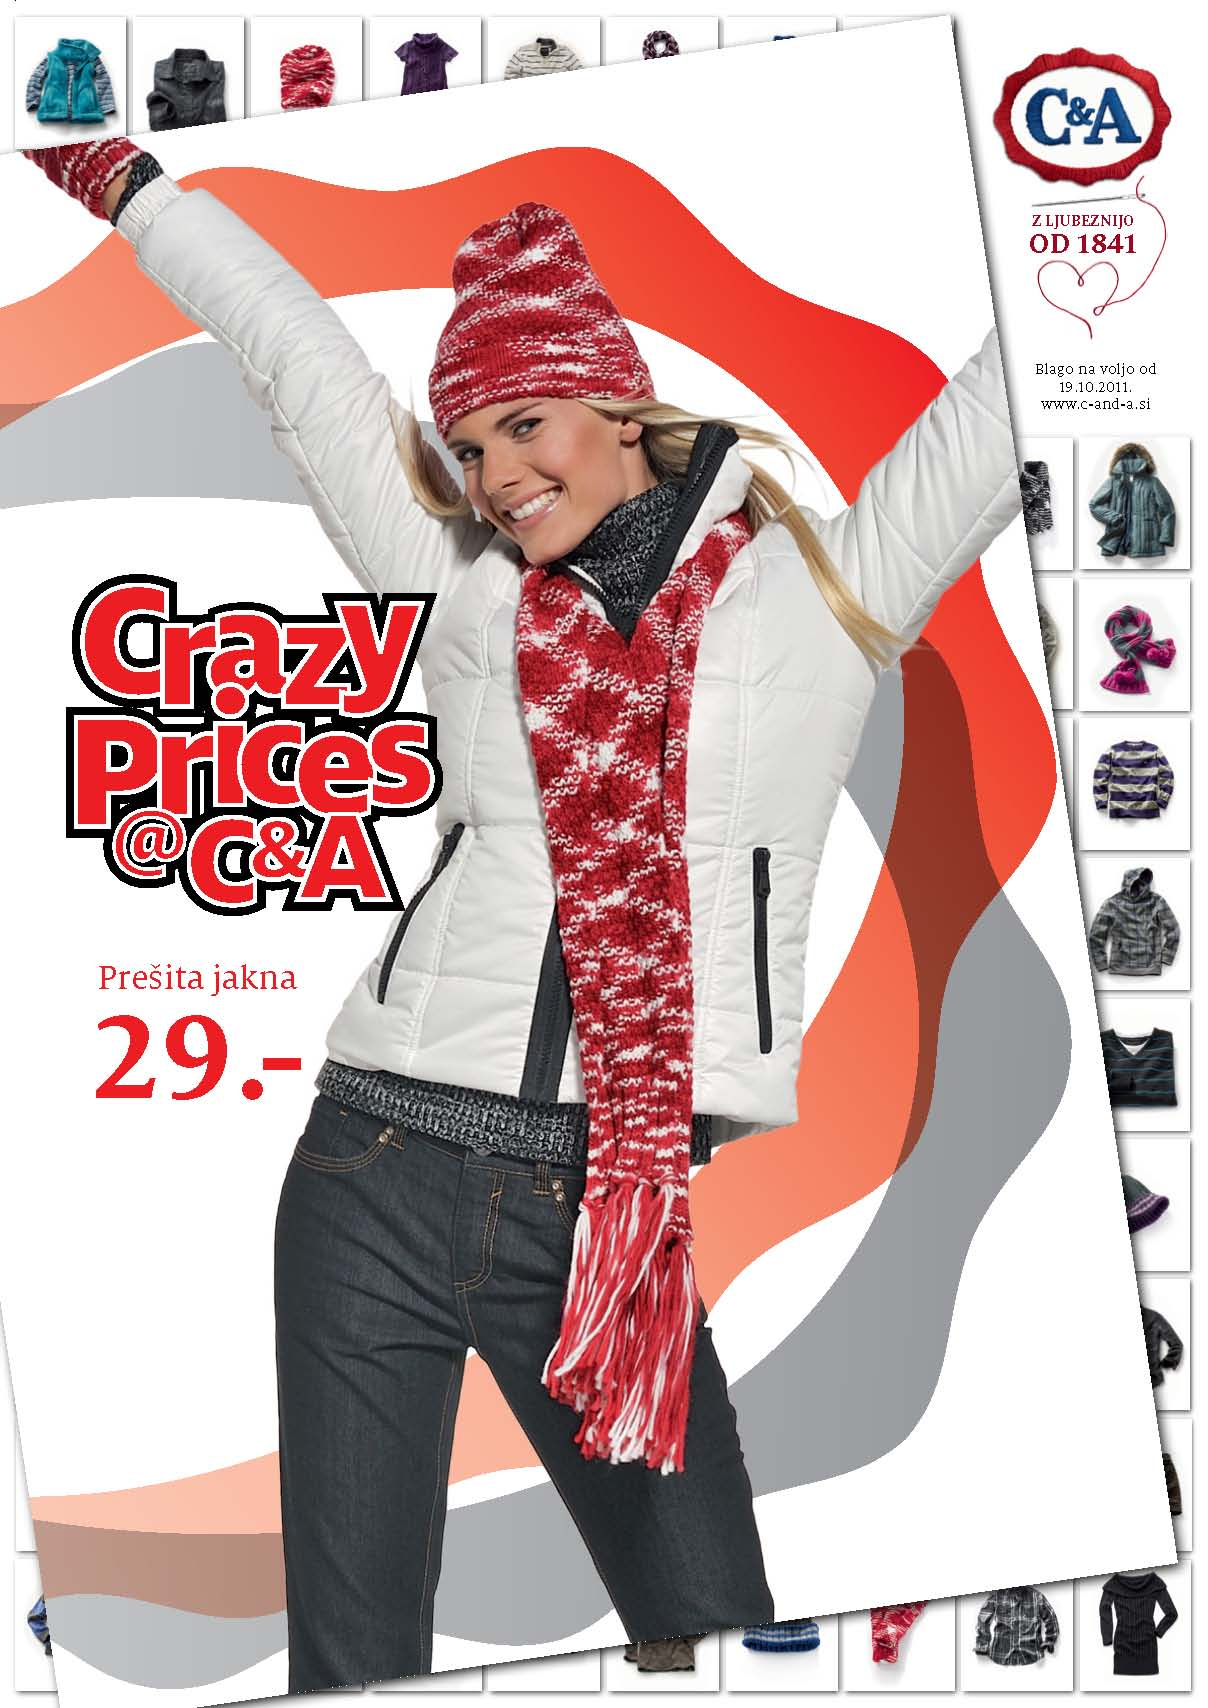 C&A - katalog Crazy prices